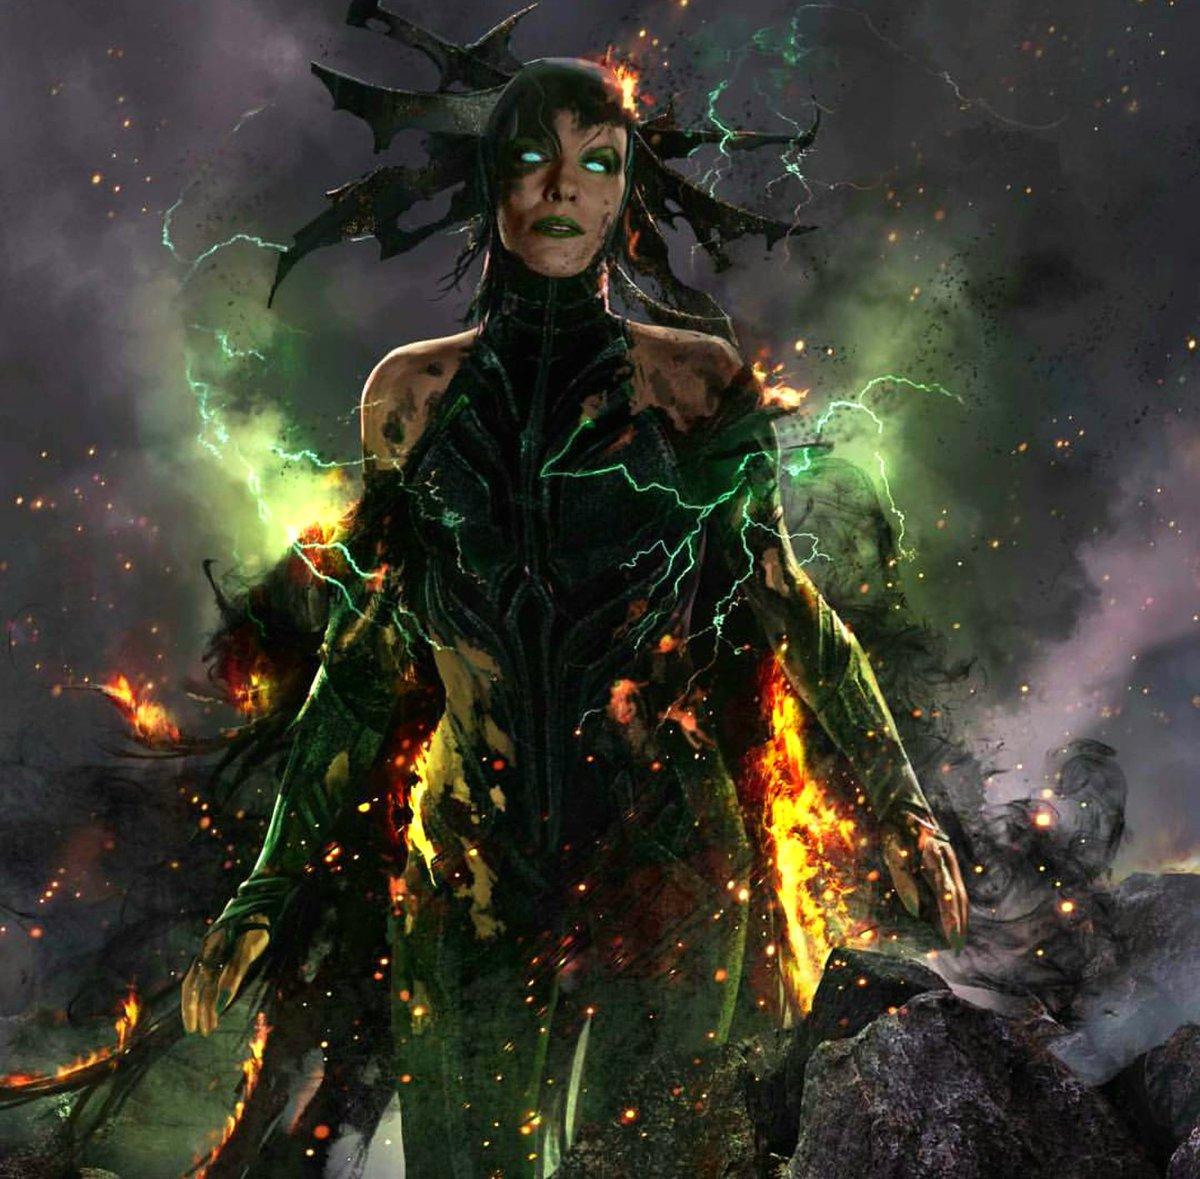 New official Hela art shows her burned...